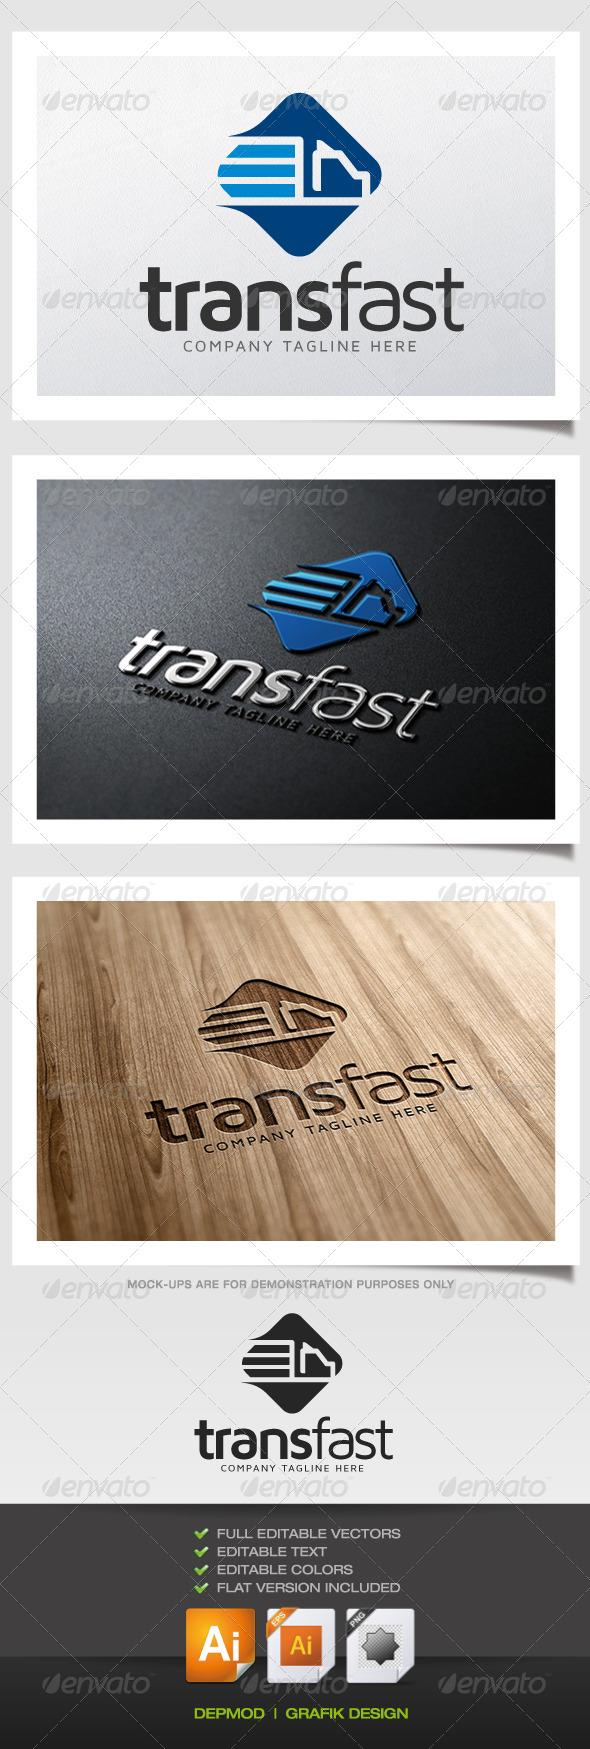 GraphicRiver Trans Fast Logo 5383127